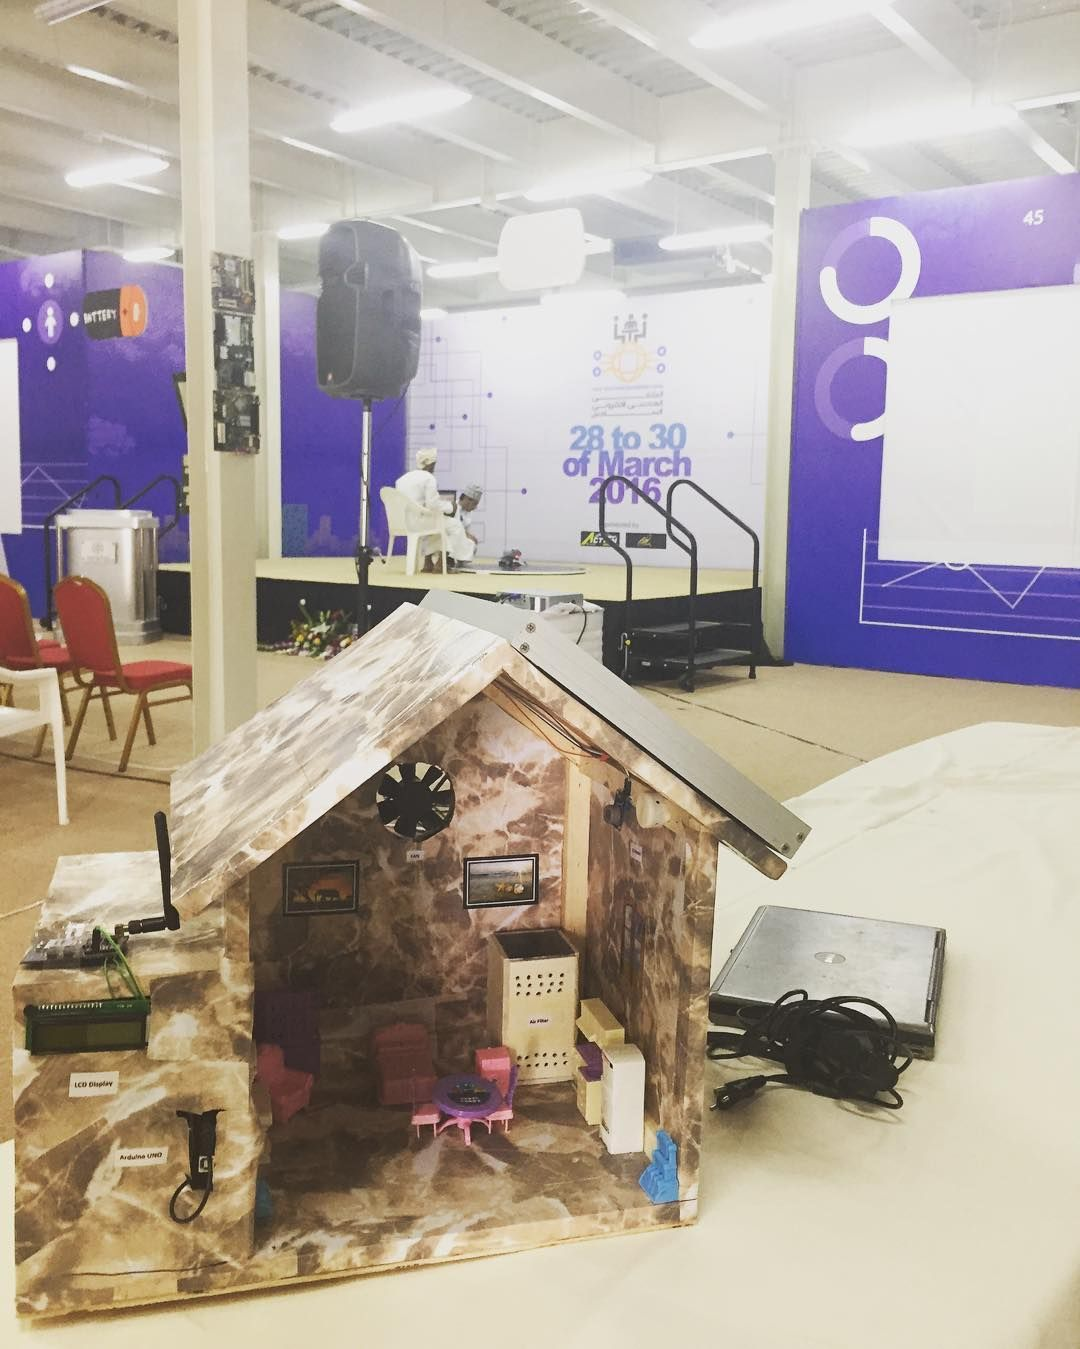 The Air Quality Project On Instagram الملتقي الهندسي الالكتروني السادس في كلية الشرق الأوسط صورة المشروع Loft Bed Decor Instagram Posts